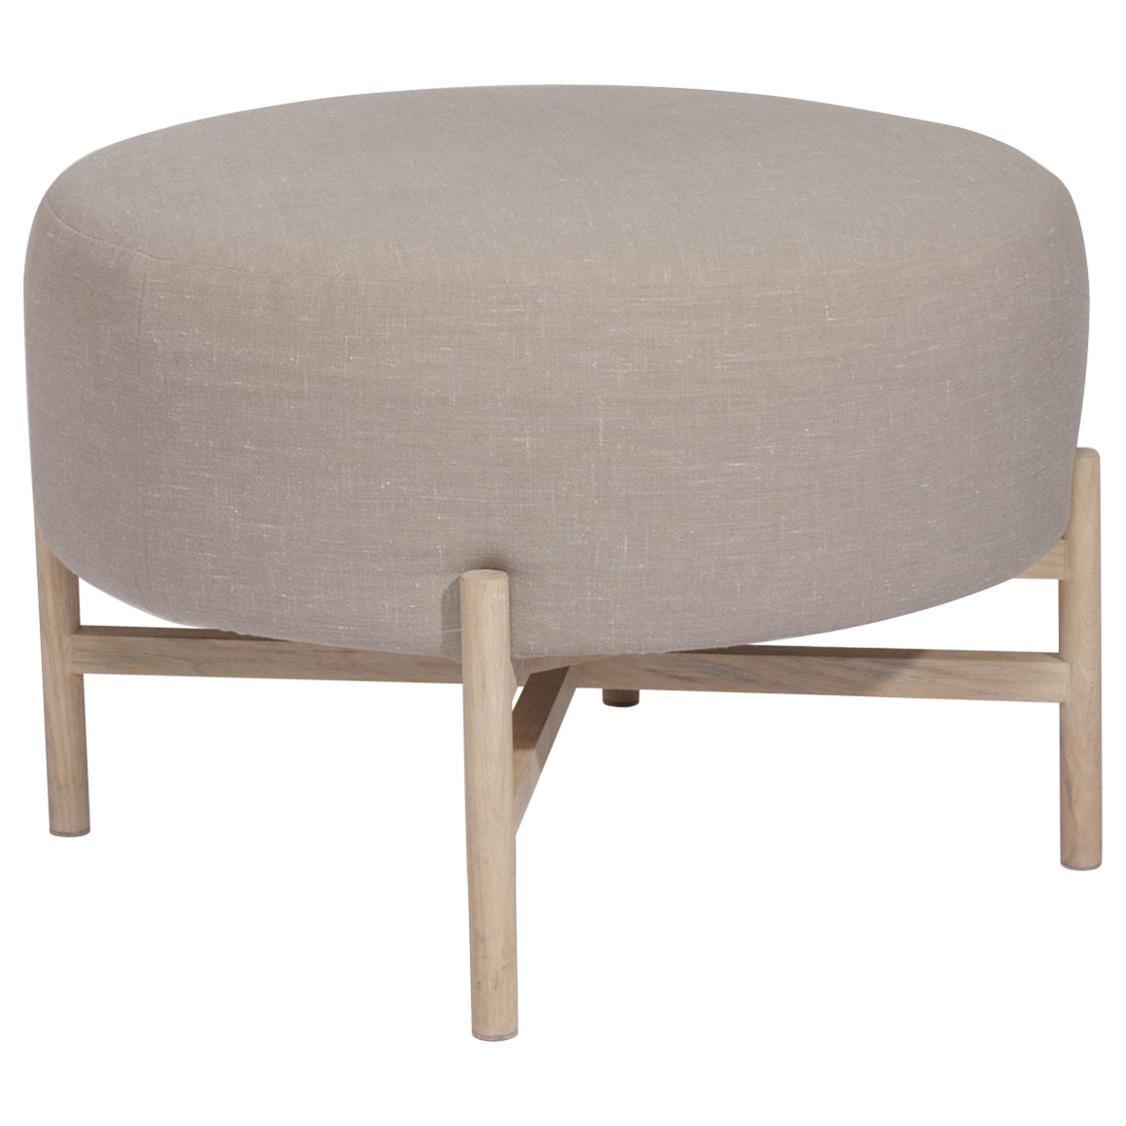 Mar upholstery and ash wood small Ottoman